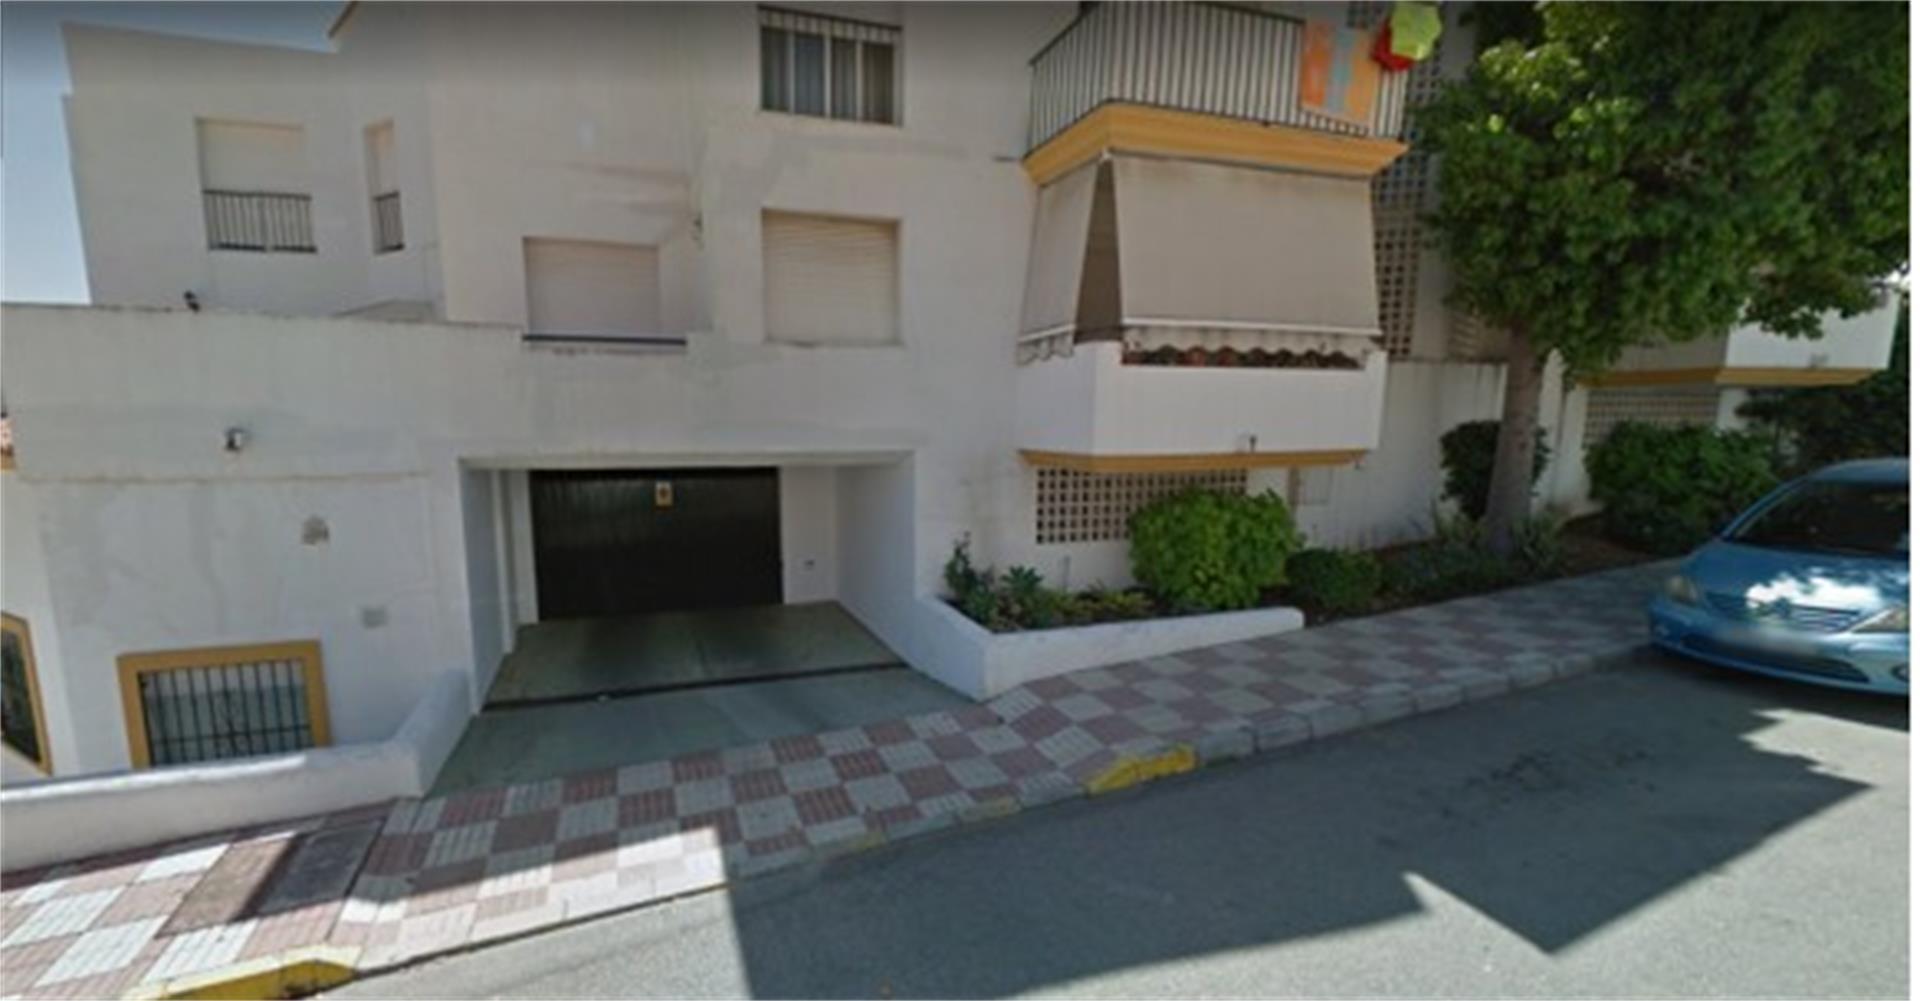 Garaje de alquiler en Camino Embalse del Taraje Bel Air - Cancelada - Saladillo (Bel-Air, Málaga)